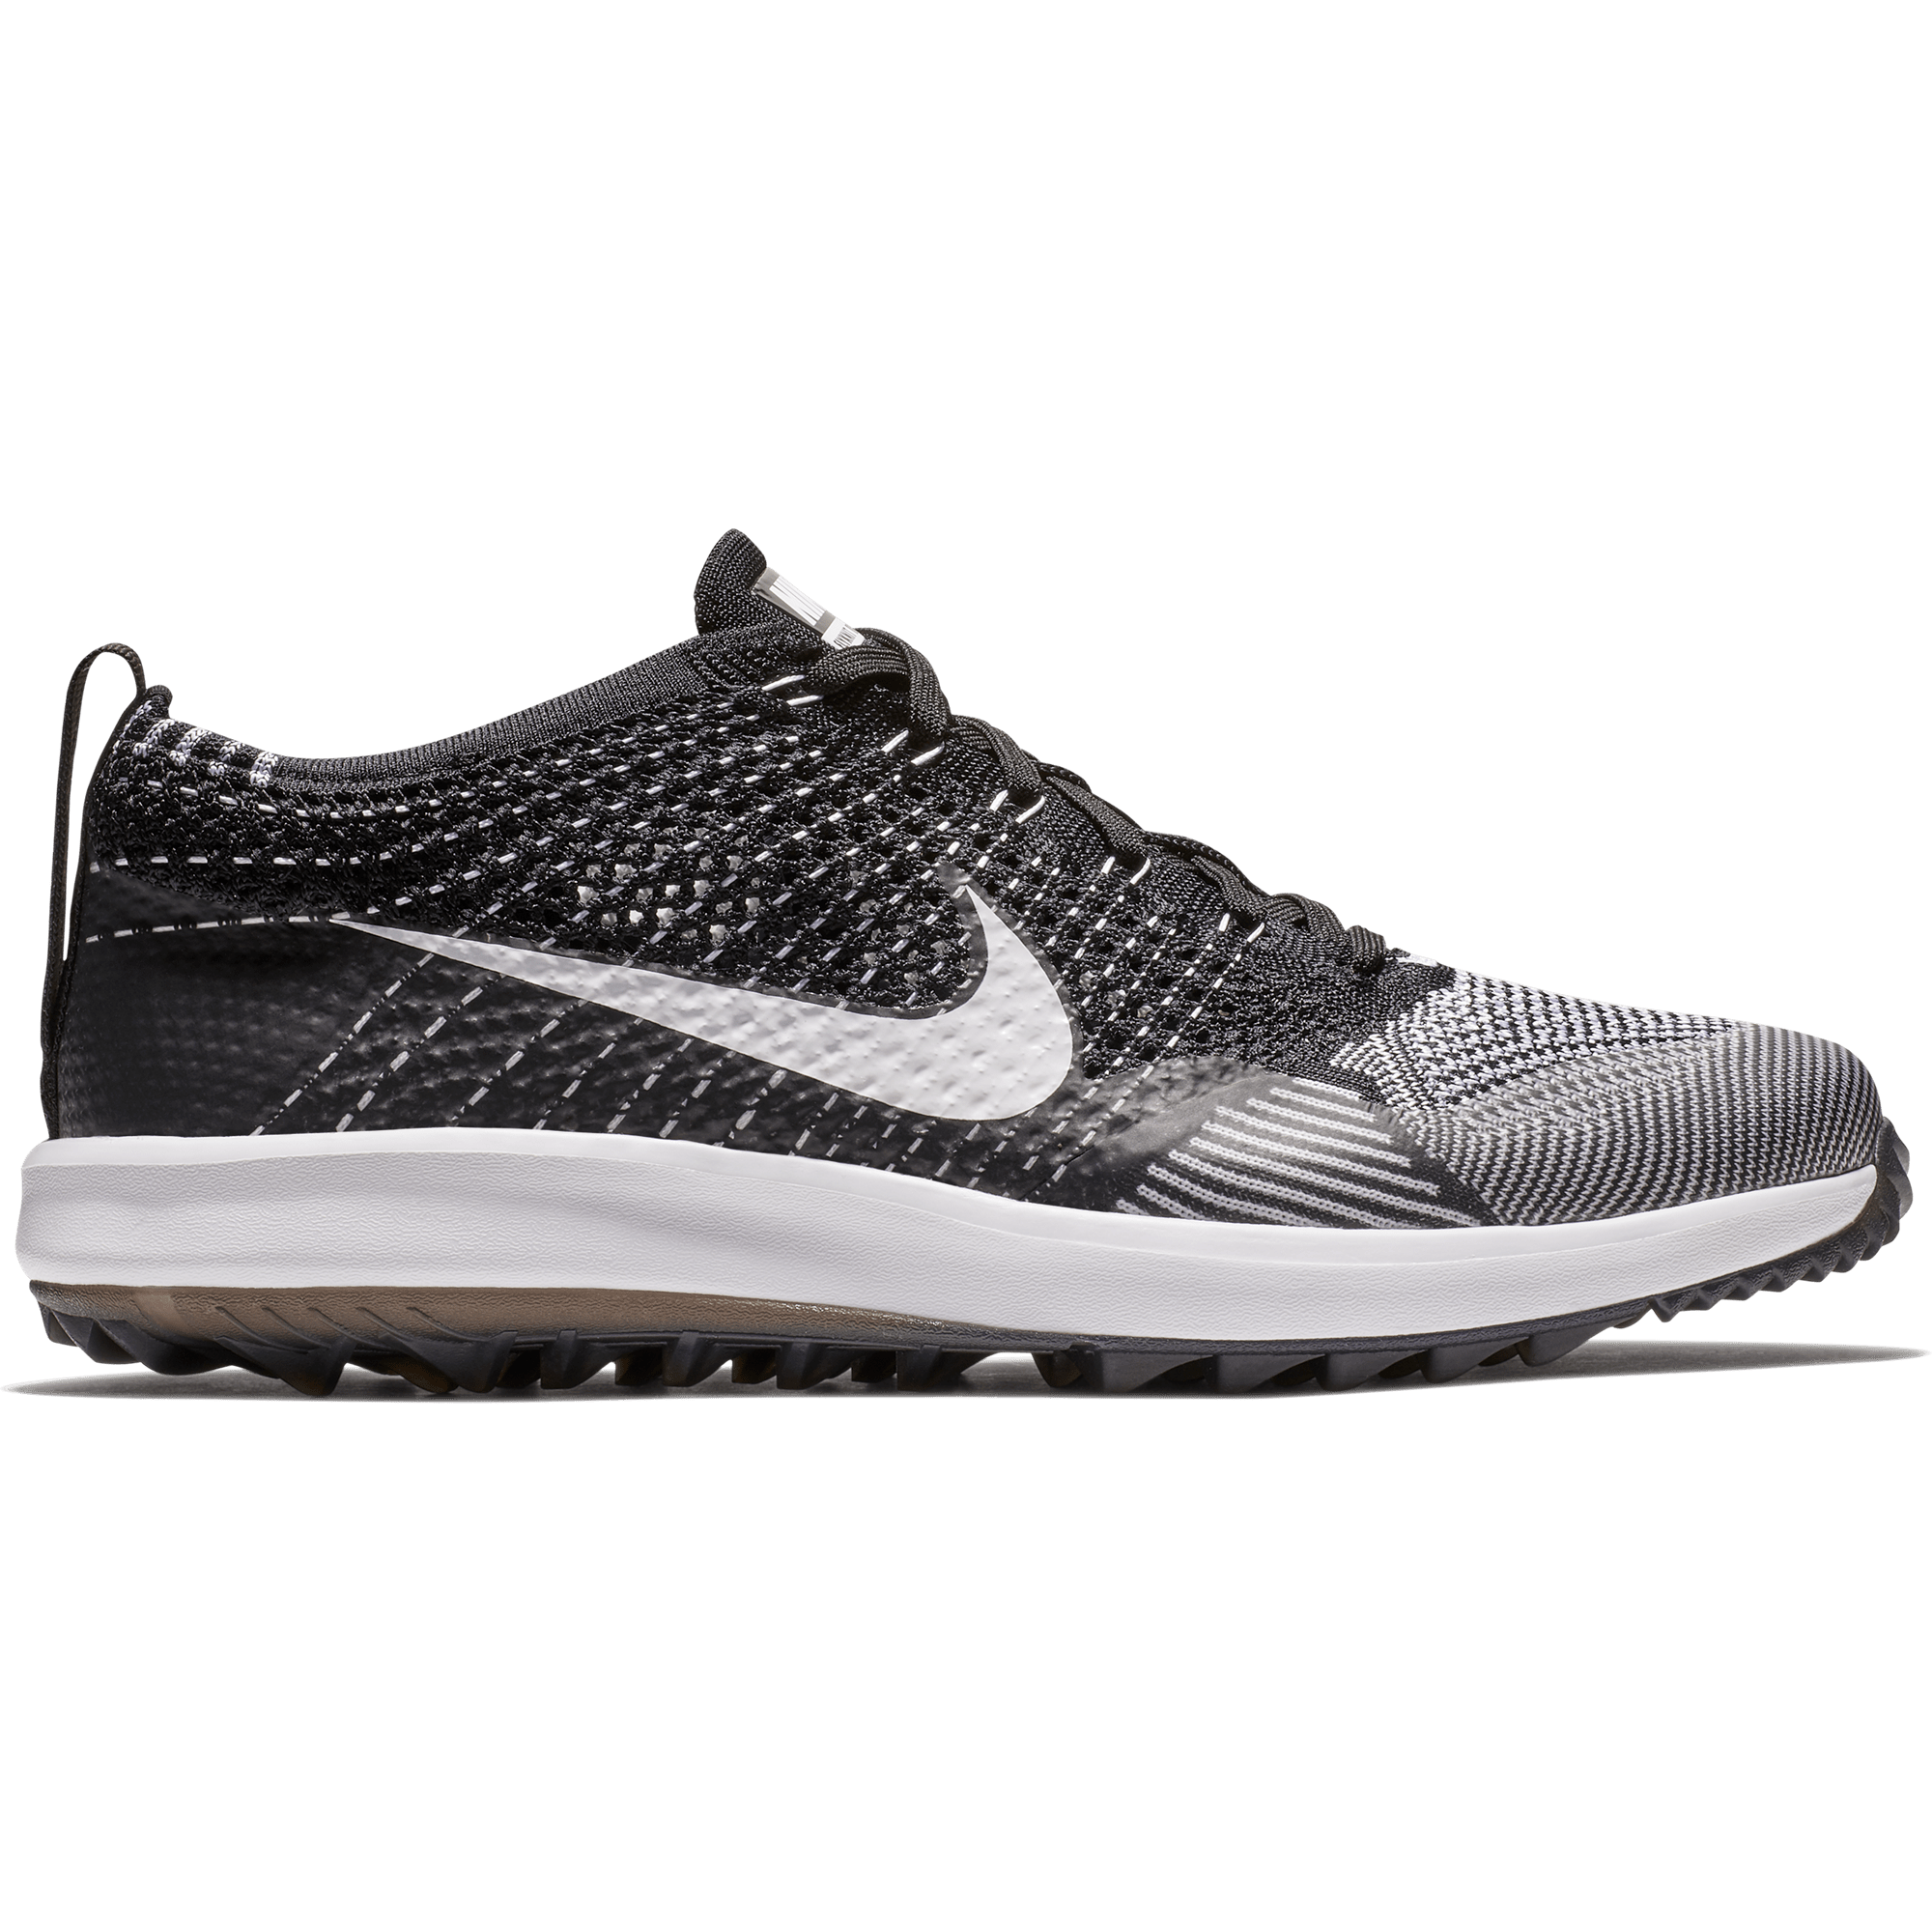 Nike Flyknit Racer G Men's Golf Shoe